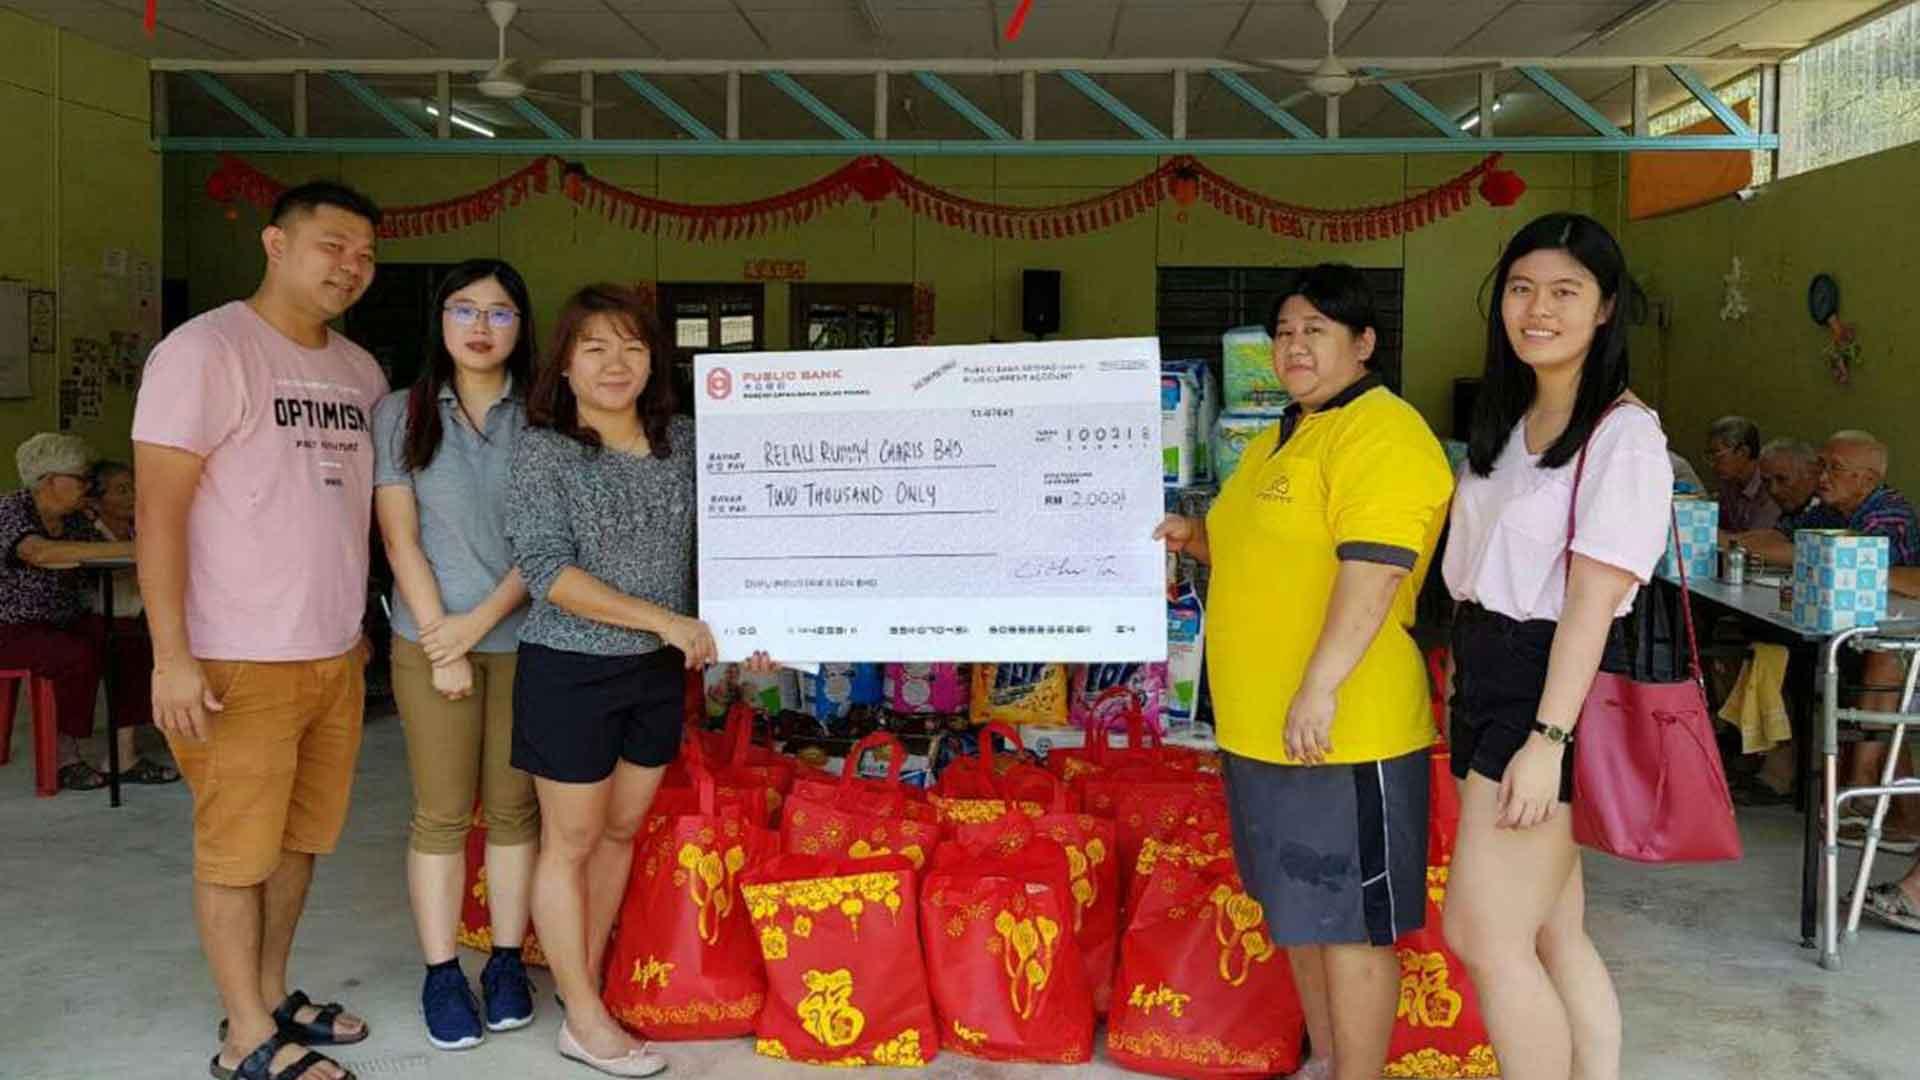 Dufu donates to Rumah Charis